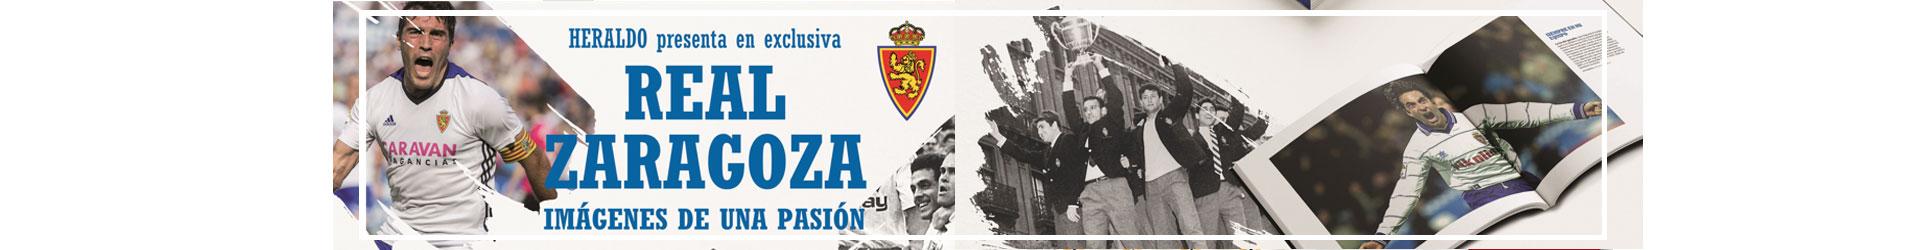 Libro Real Zaragoza